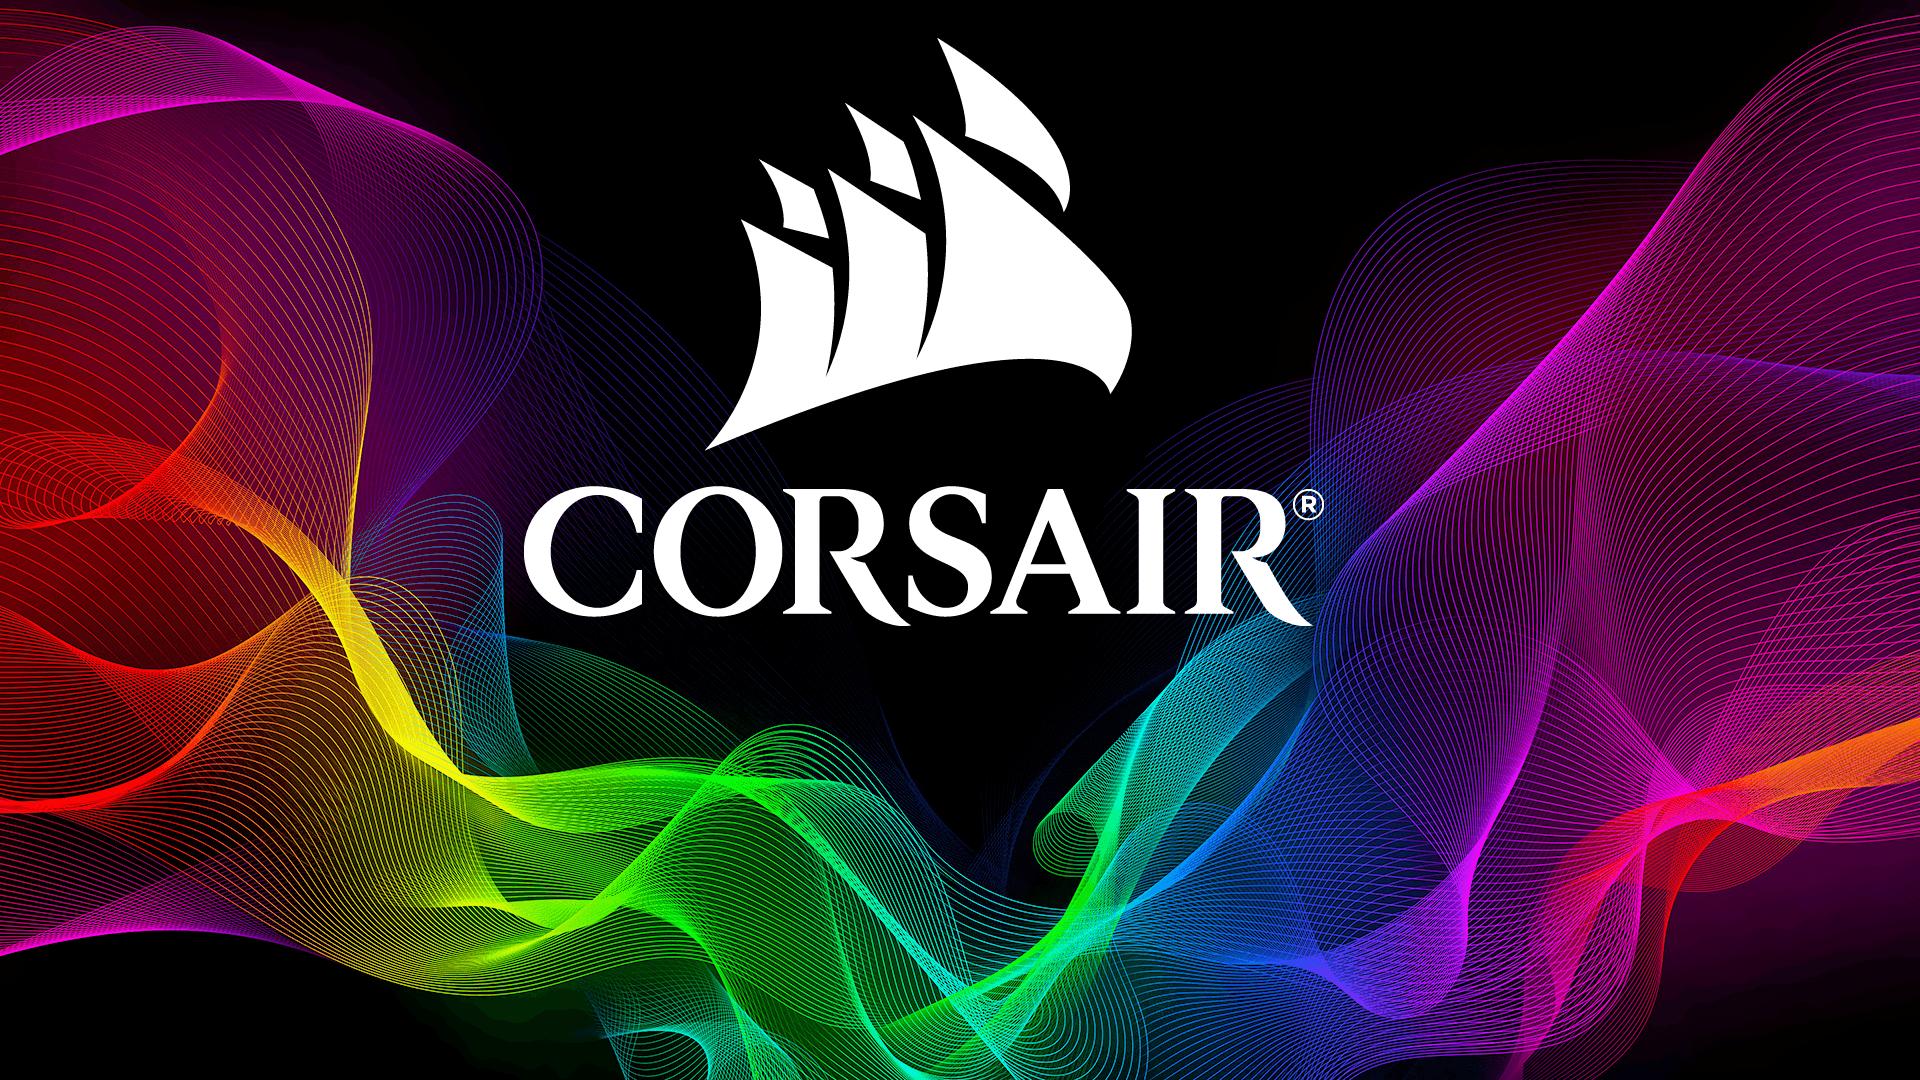 Corsair RGB Wallpapers - Top Free Corsair RGB Backgrounds - WallpaperAccess